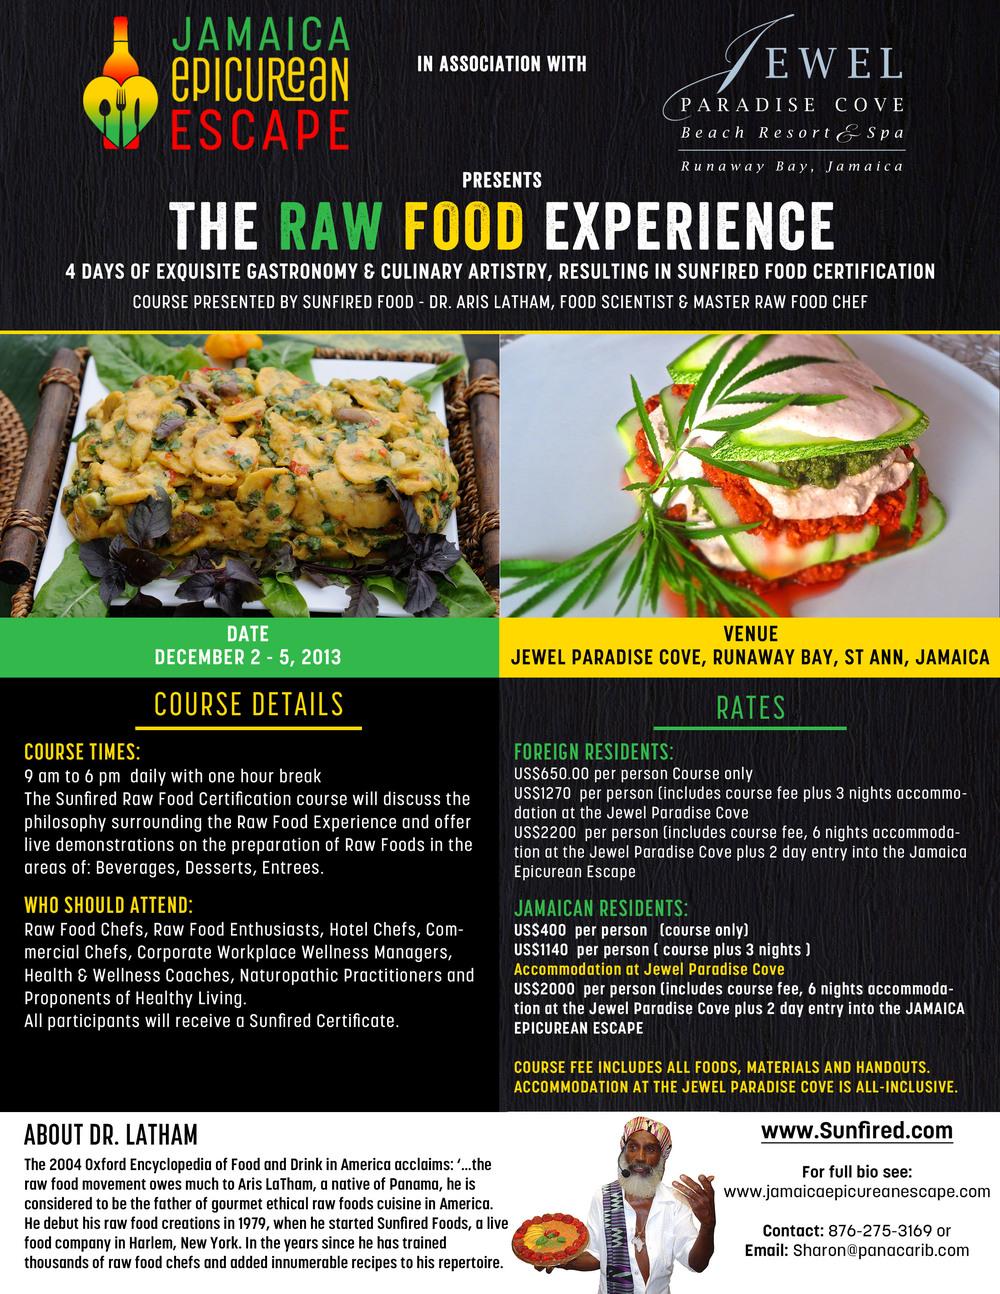 Jamaica Epicurean Escape Raw Food Flyer.jpg